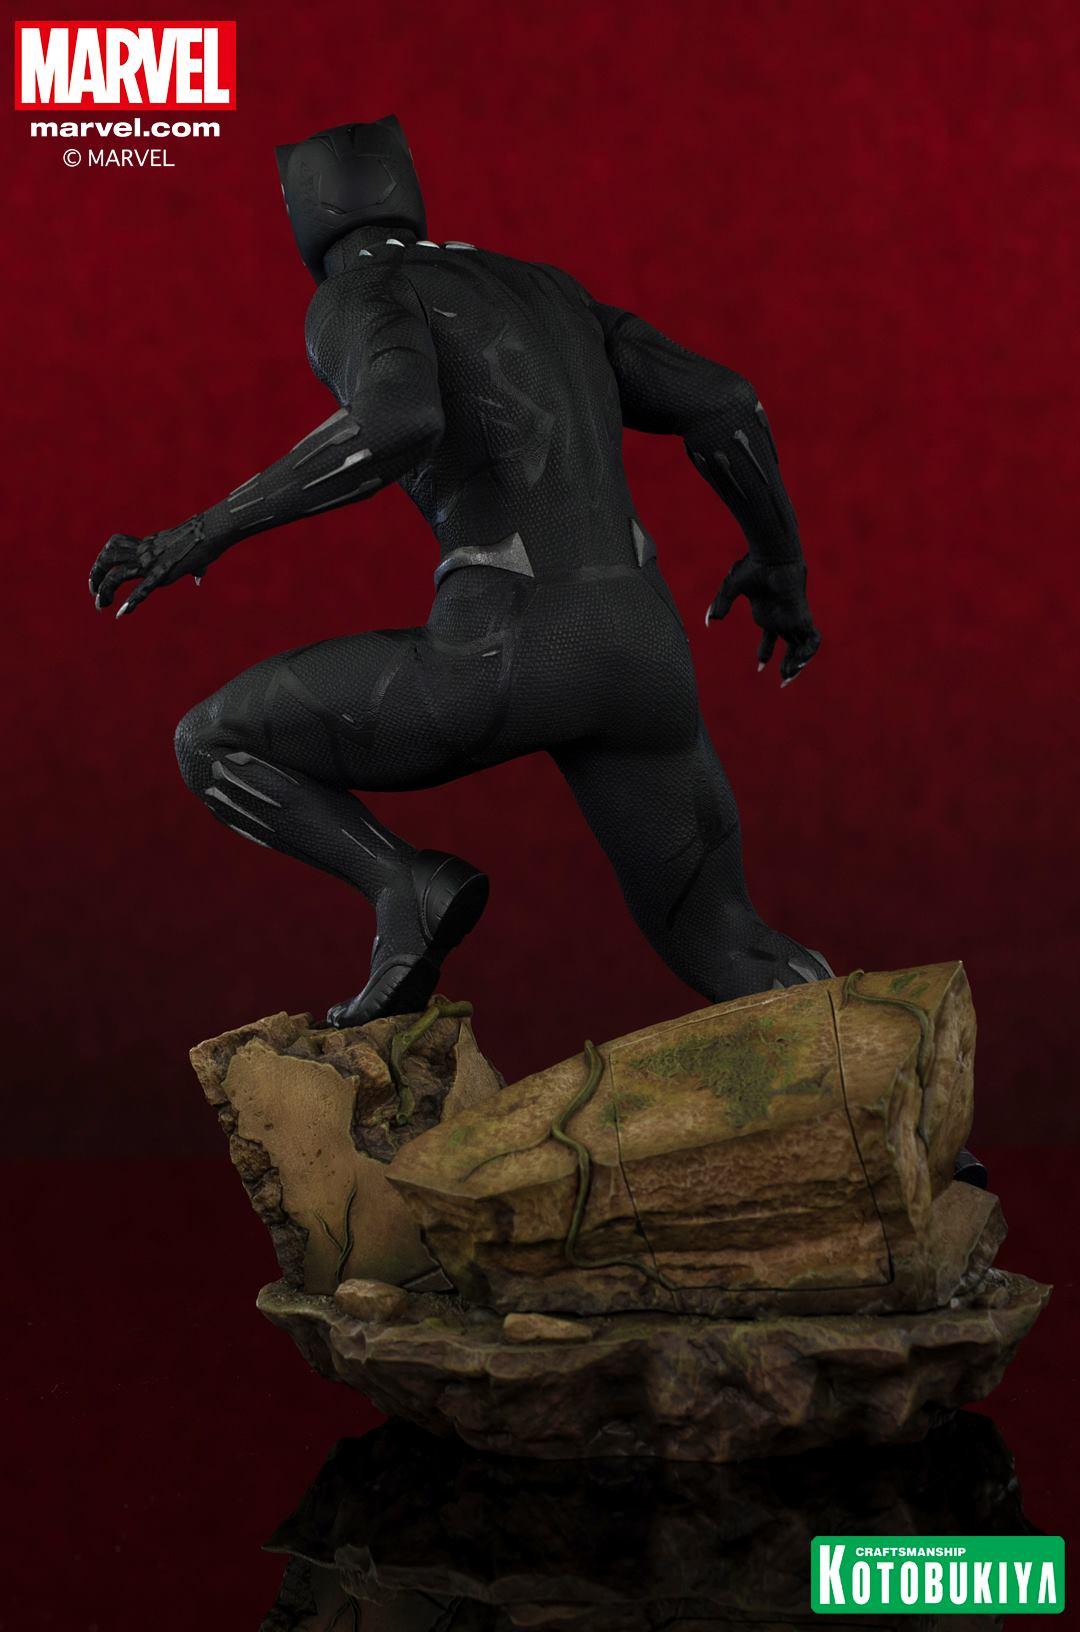 Koto-Black-Panther-Movie-Statue-005